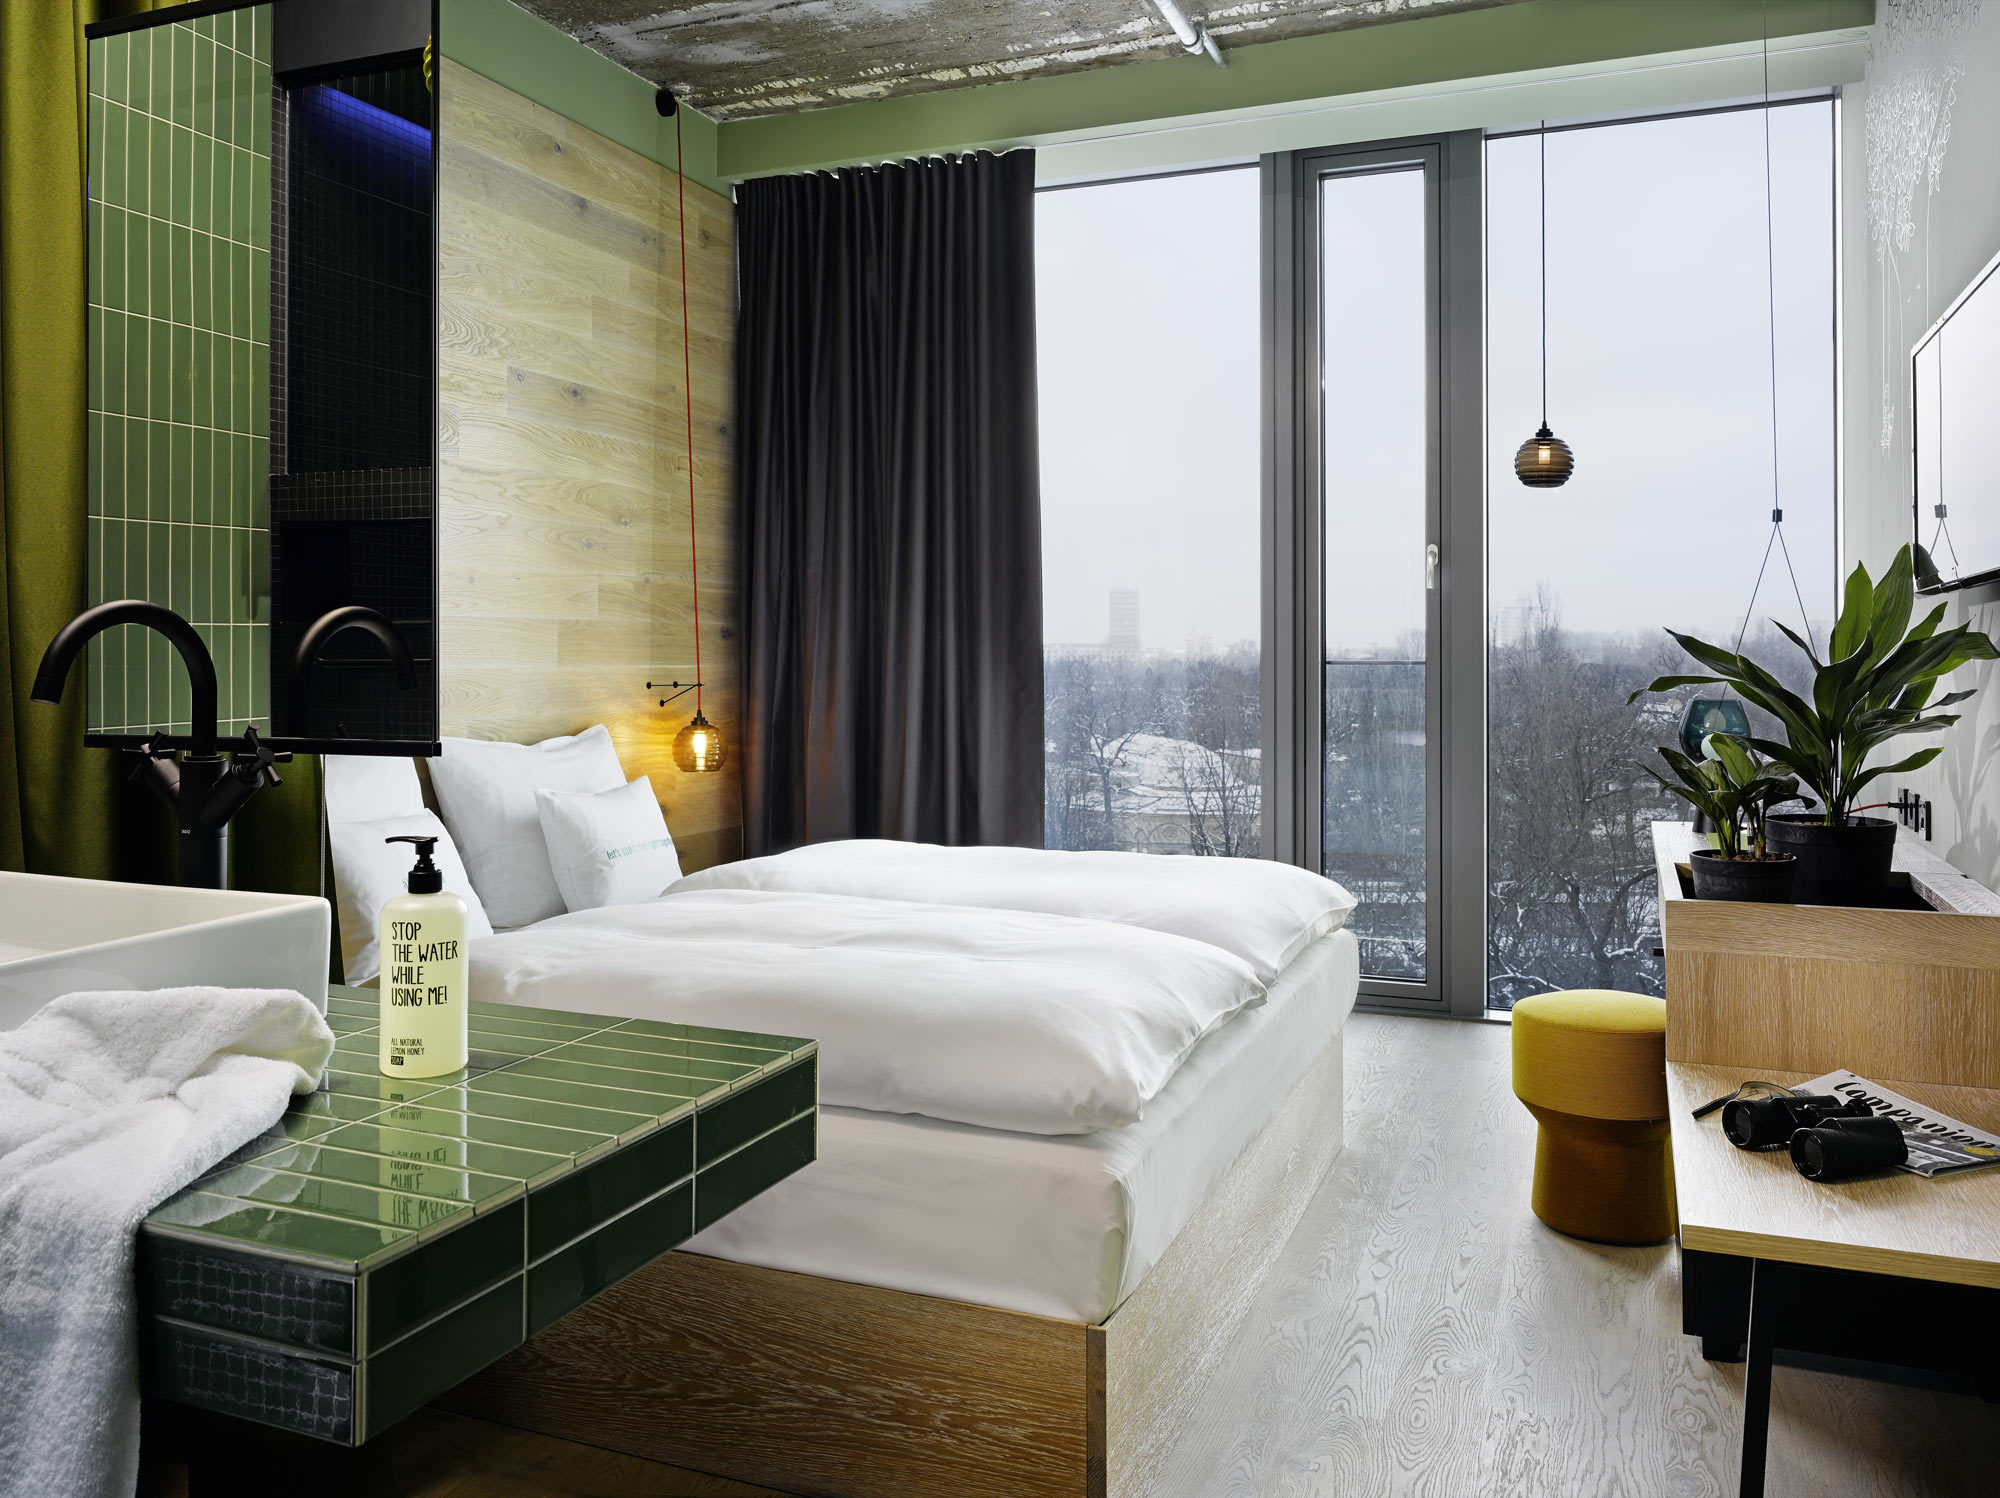 25hours Hotel Bikini Berlin von Werner Aisslinger, Berlin (2014), Foto: Studio Aisslinger